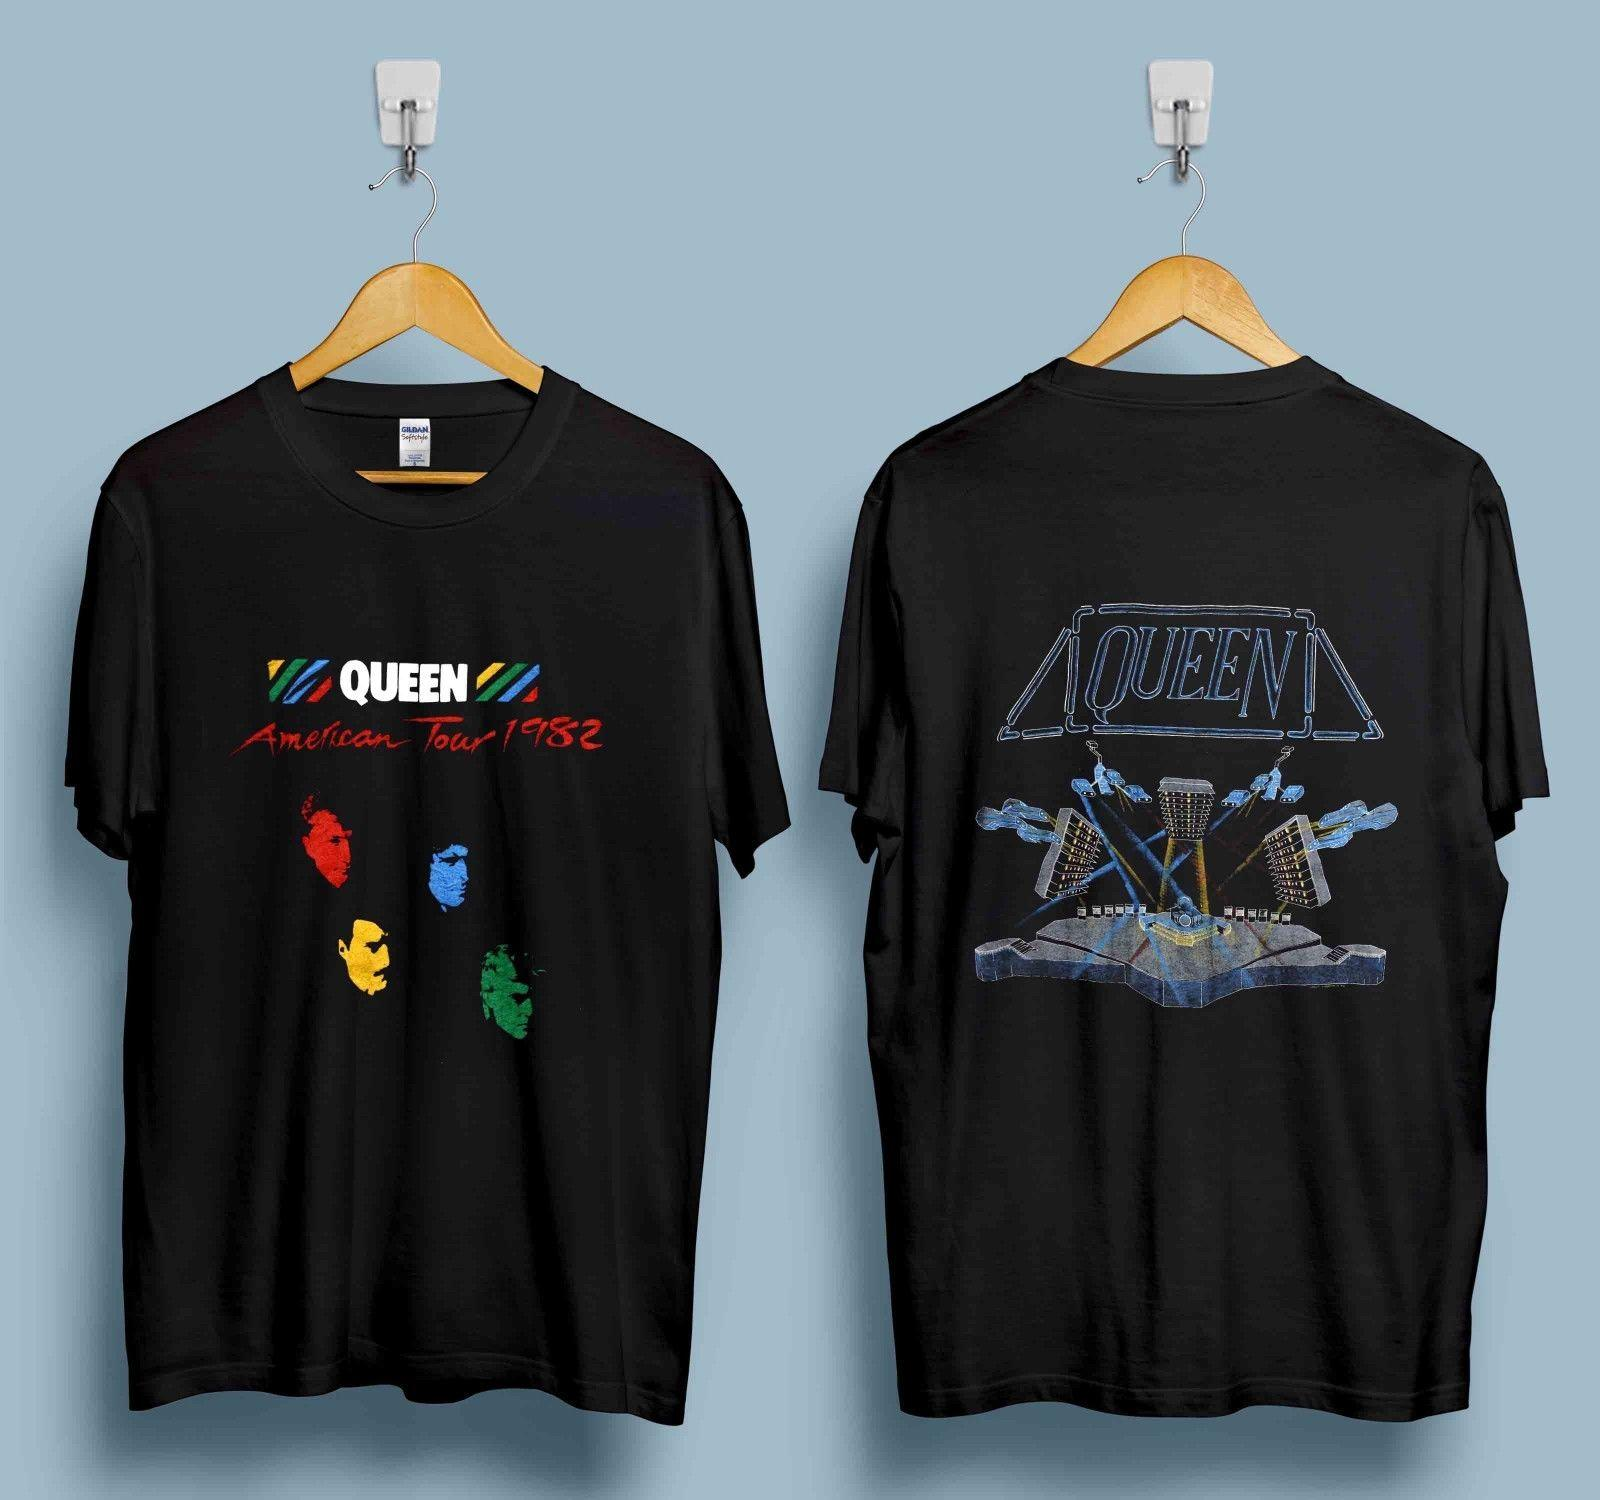 05f5a58278ac8 Vintage Queen Tshirt 1982 Hot Space Tour Glam Rock Band Freddie Mercury  Reprint Hot 2019 Summer Men S T Shirt Fashion Tee Shirt Designers Funny  Print T ...